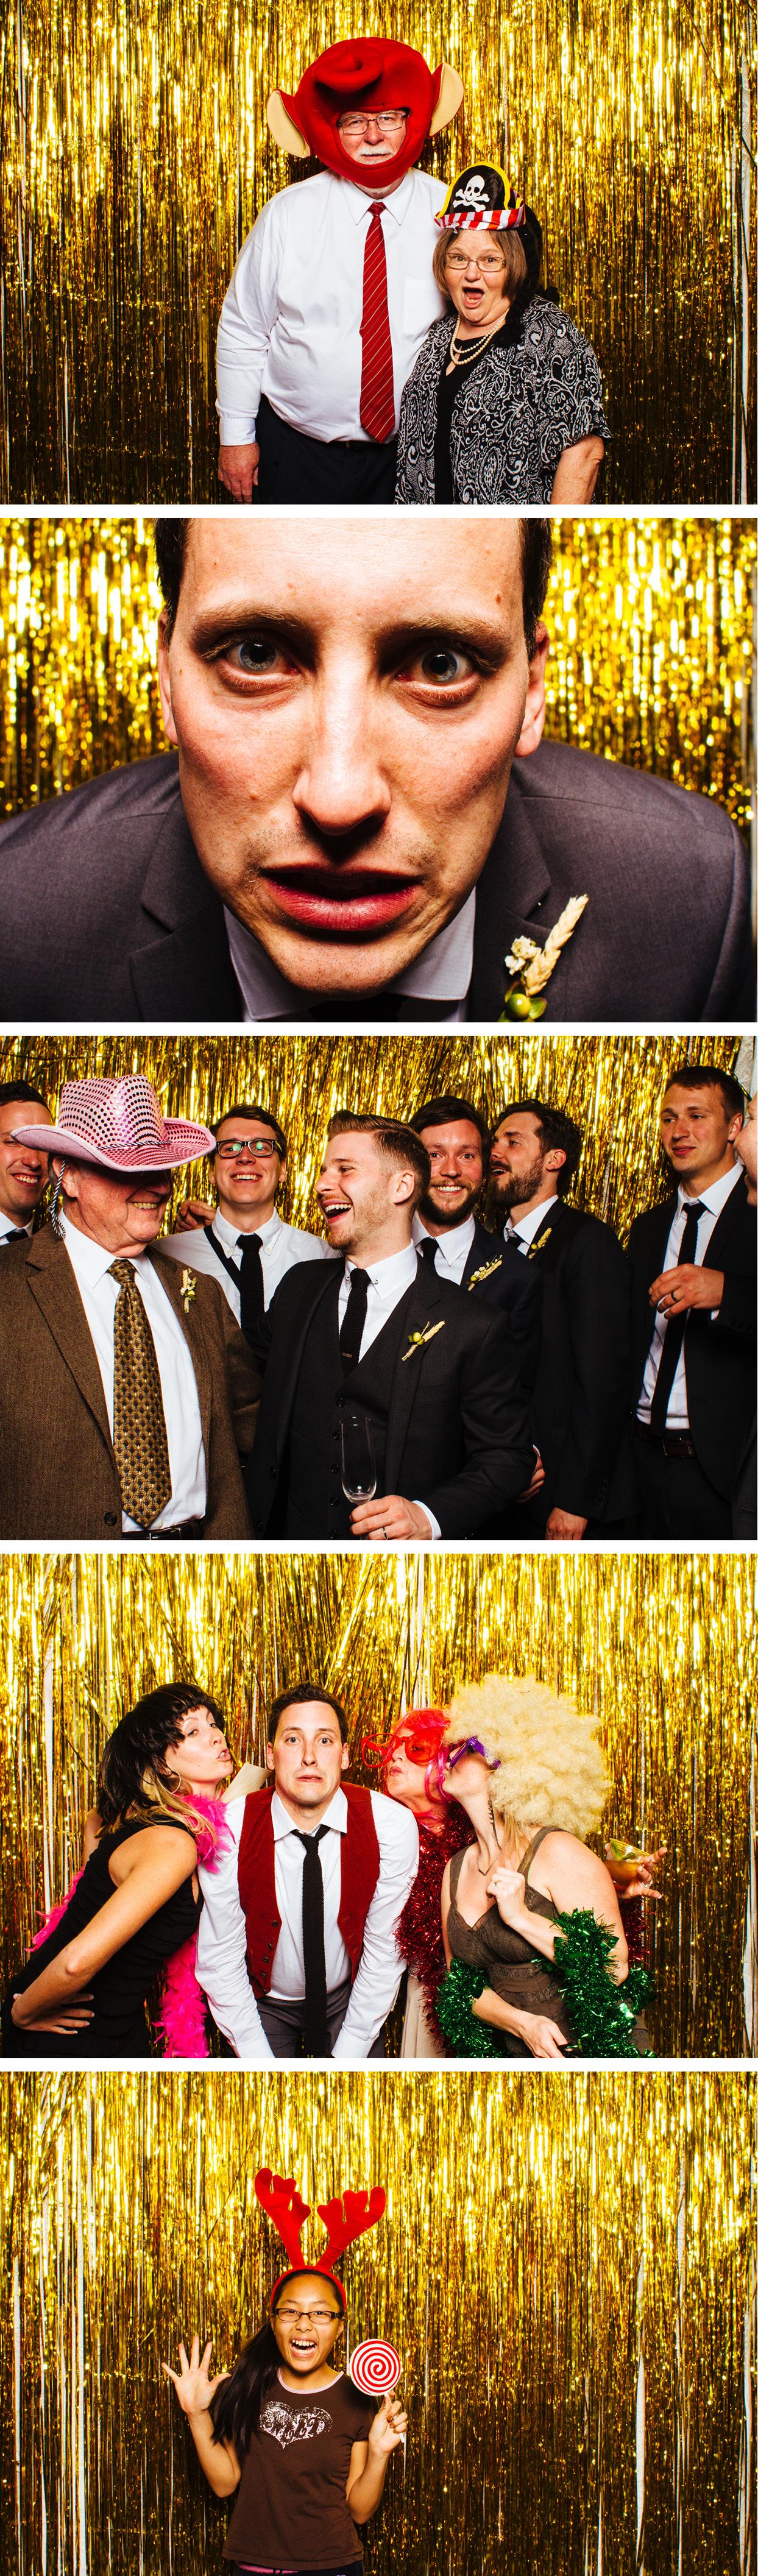 CK-Photo-Nashville-Wedding-Photographer-Photobooth-DL5.jpg